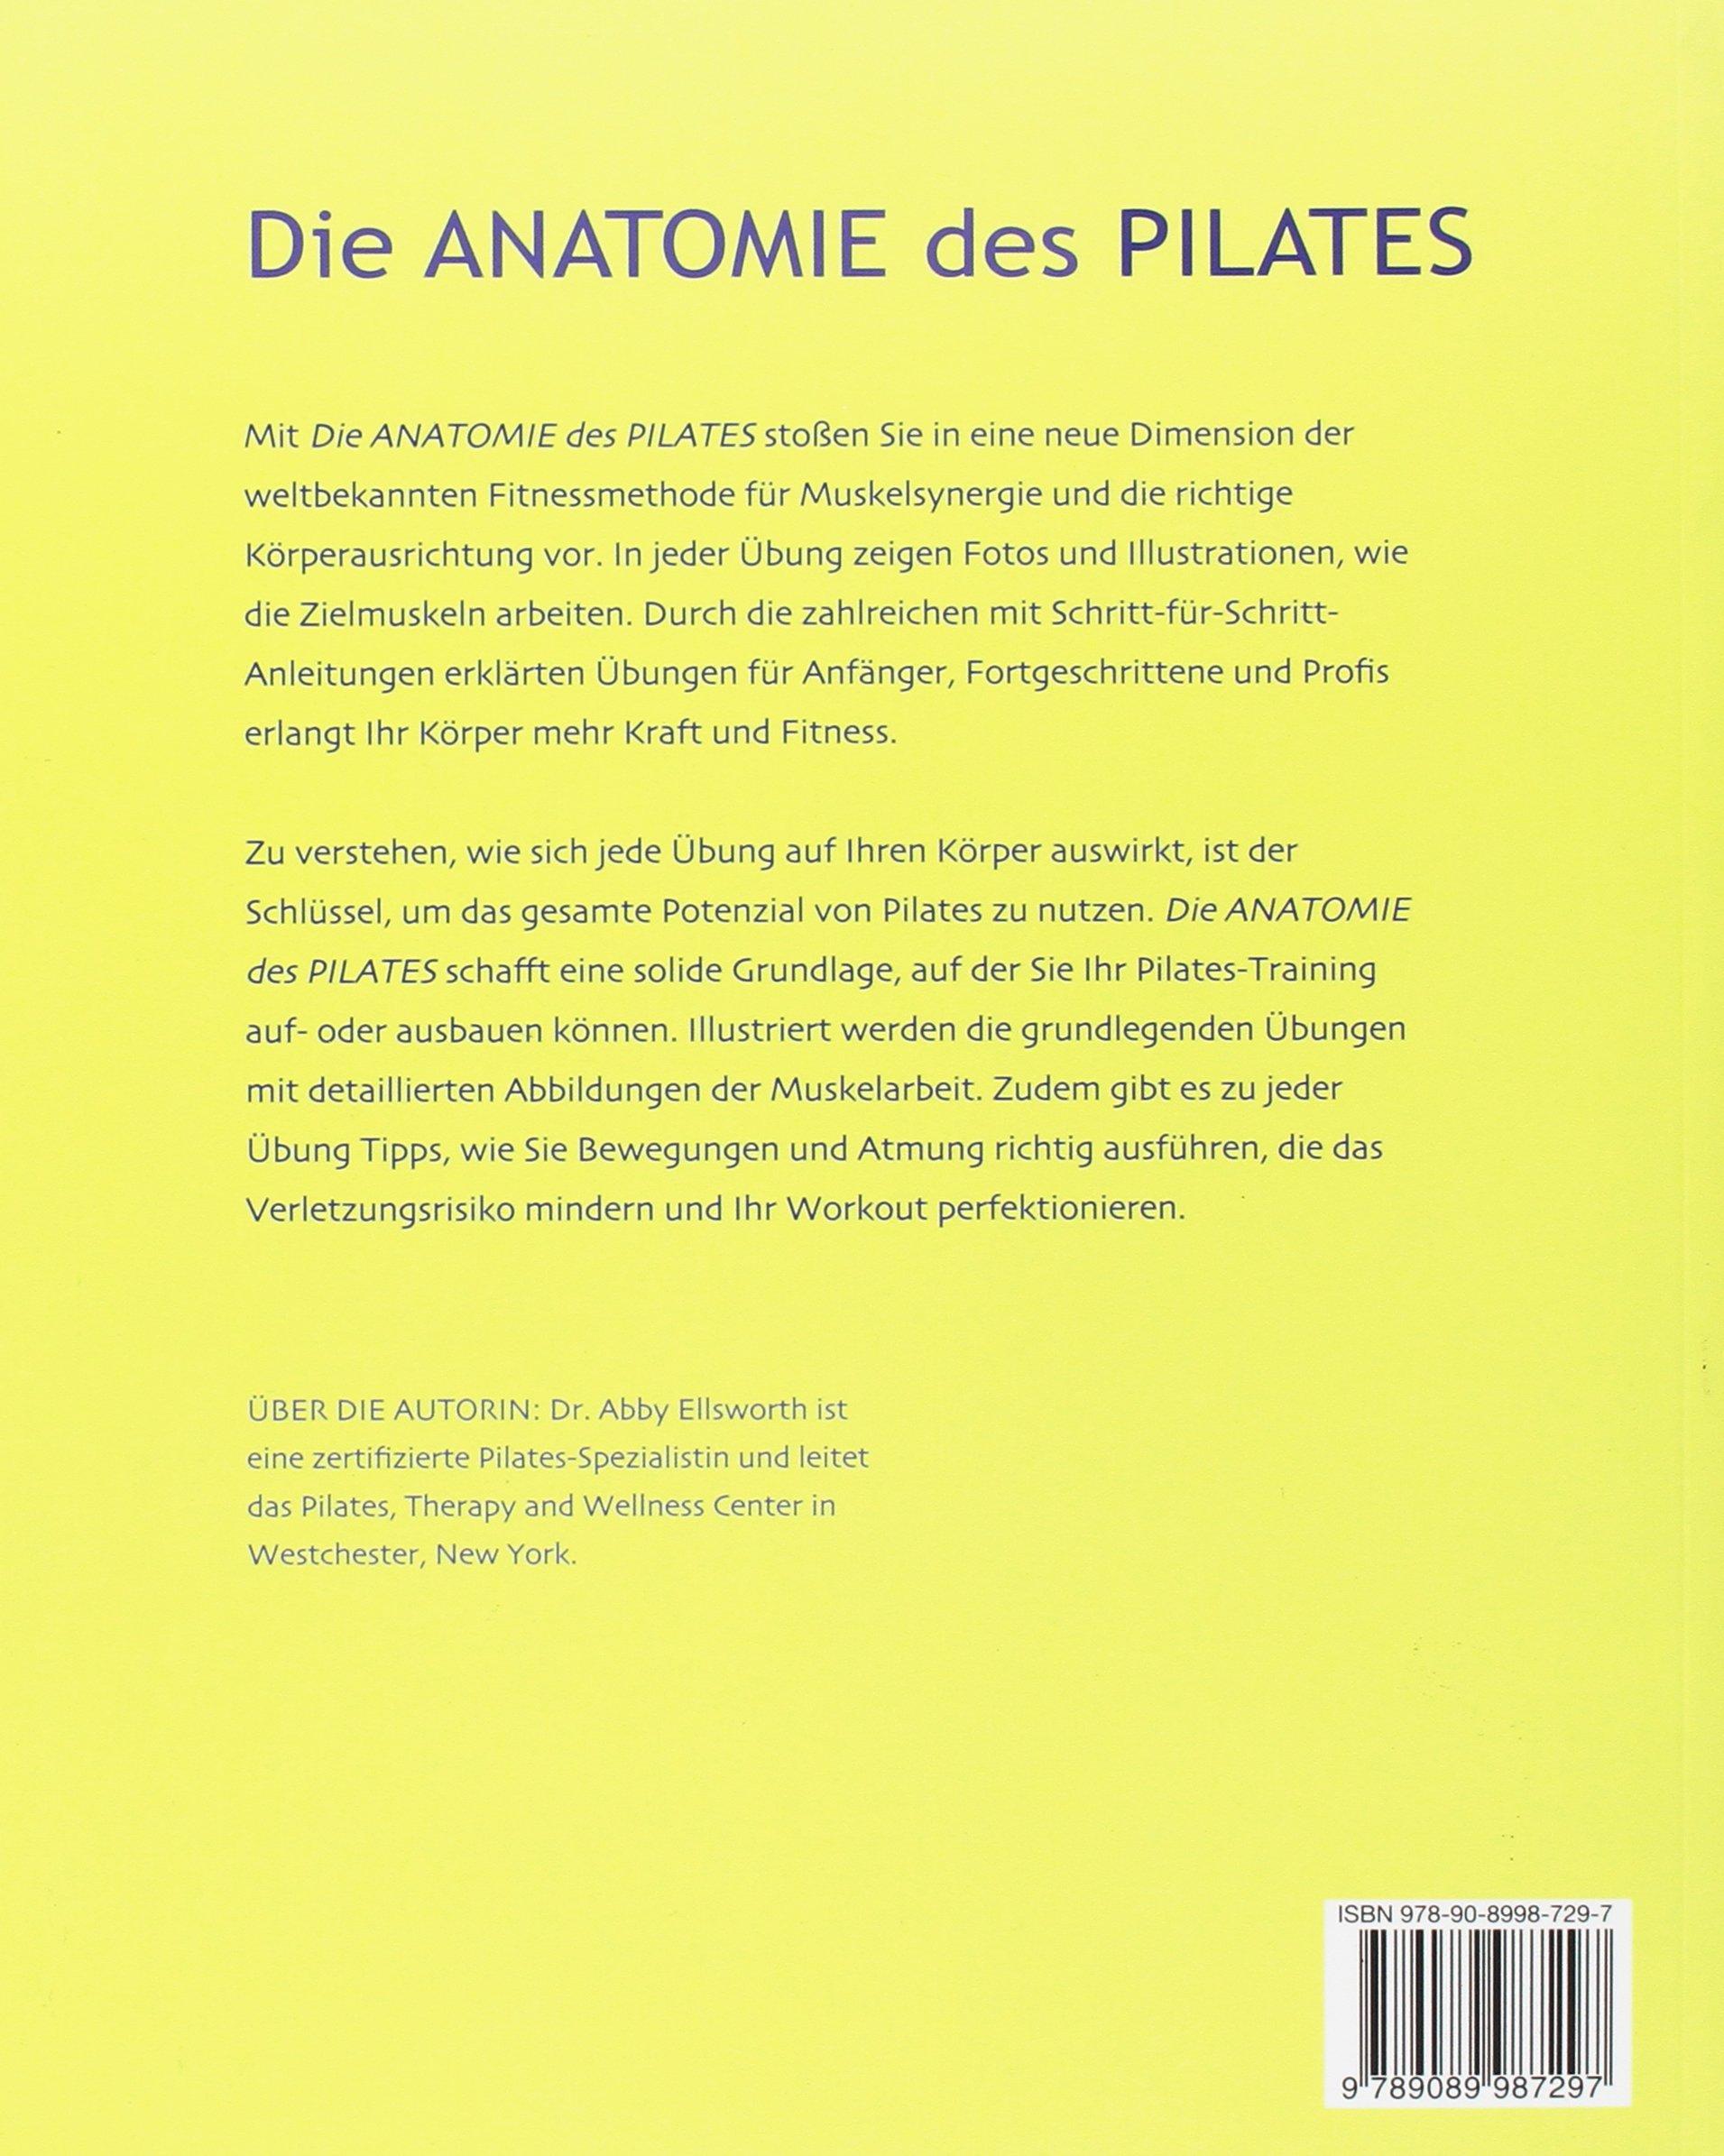 DIE ANATOMIE DES PILATES: Amazon.de: DR. ABIGAIL ELLSWORTH: Bücher